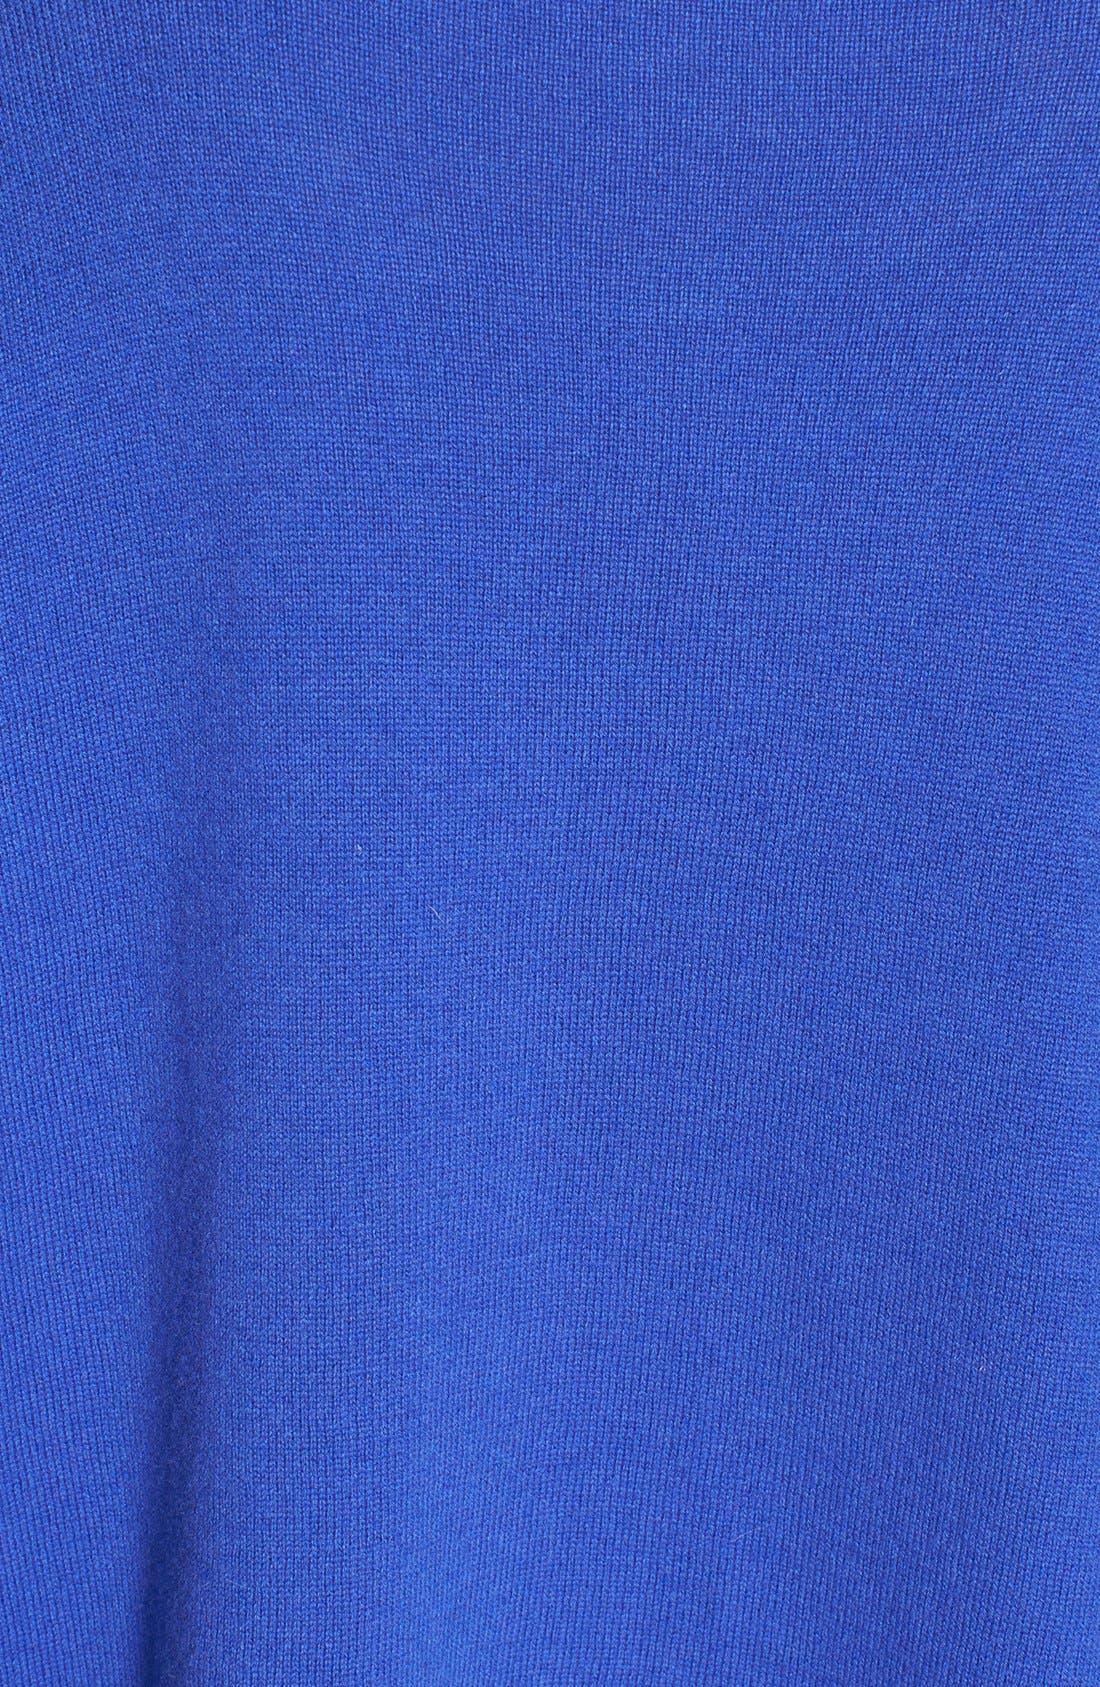 Alternate Image 3  - Joie 'Tambrel' Asymmetrical Sweater Tunic